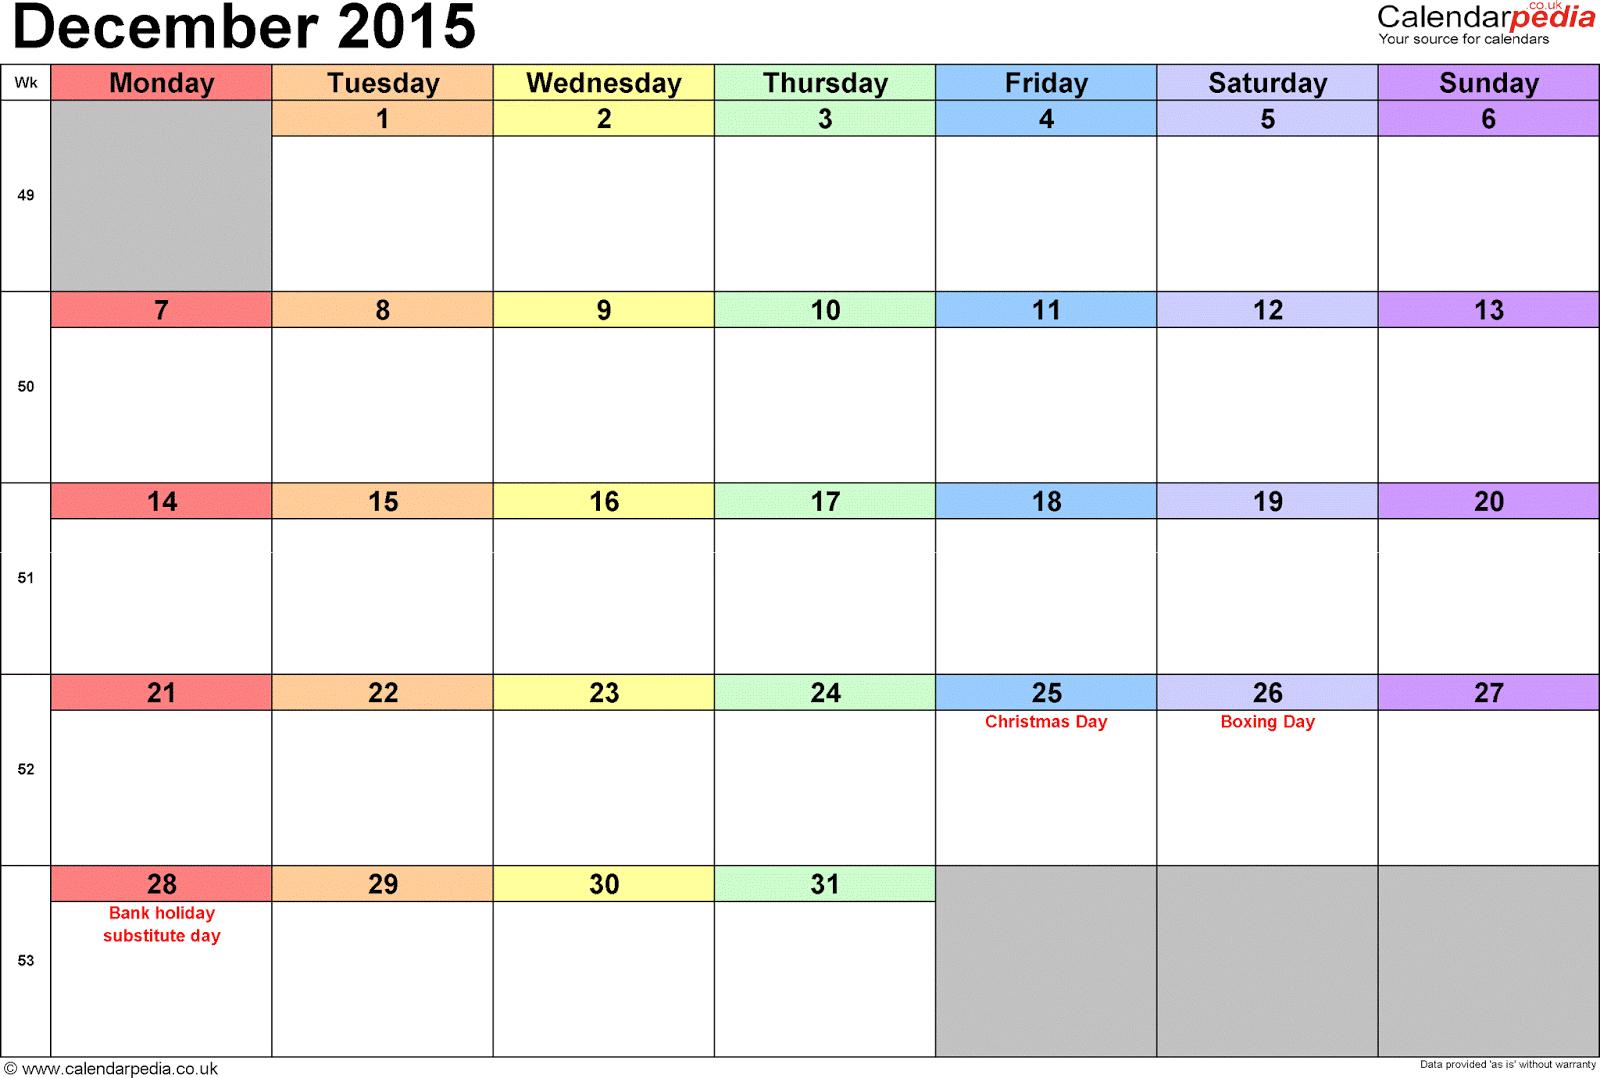 Calendar For December 2015, January 2016: December 2015 pertaining to December 2015 Calendar Printable